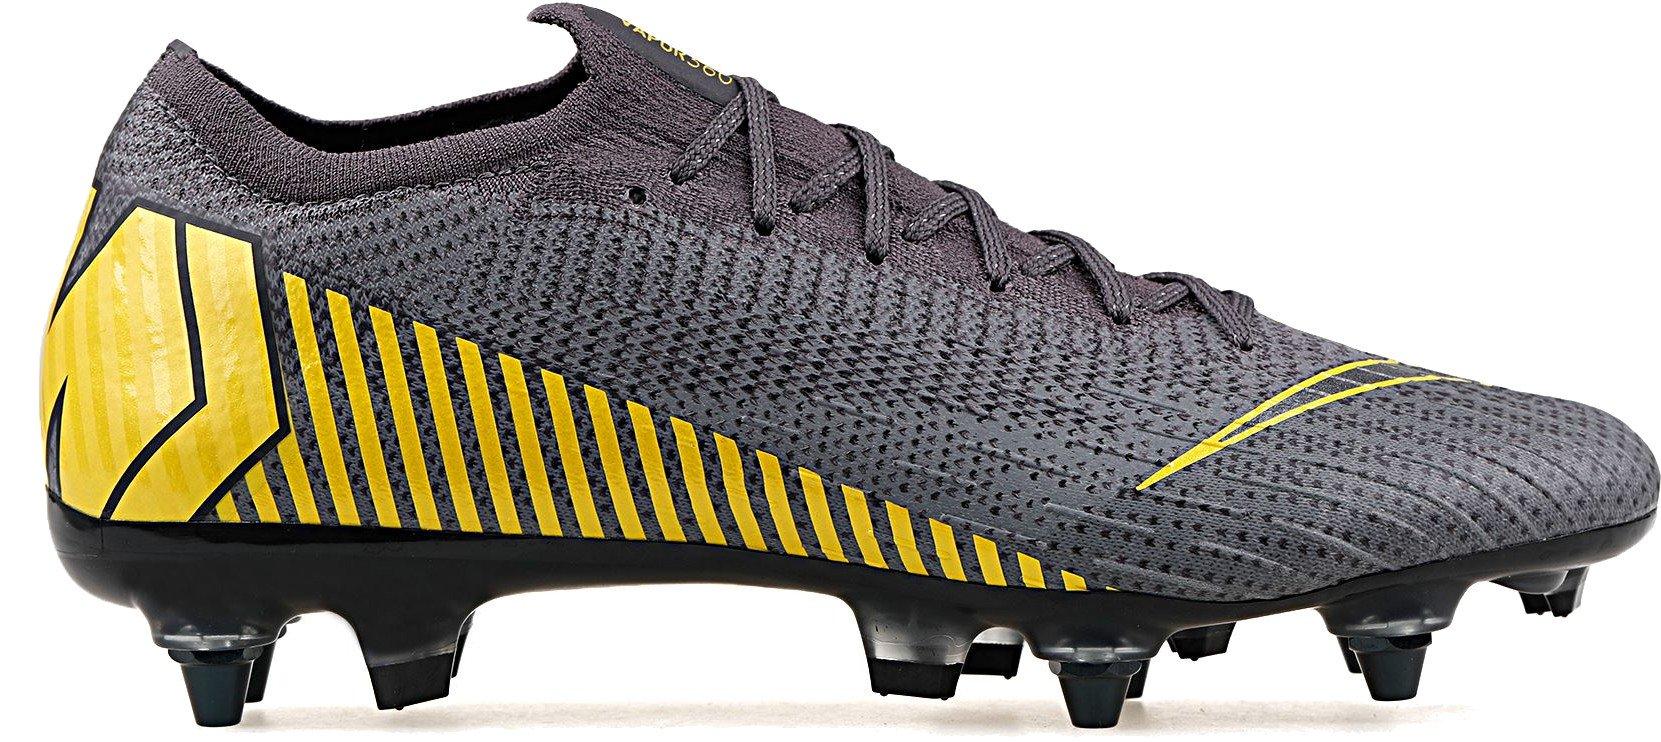 Kopačky Nike VAPOR 12 ELITE SG-PRO AC šedá